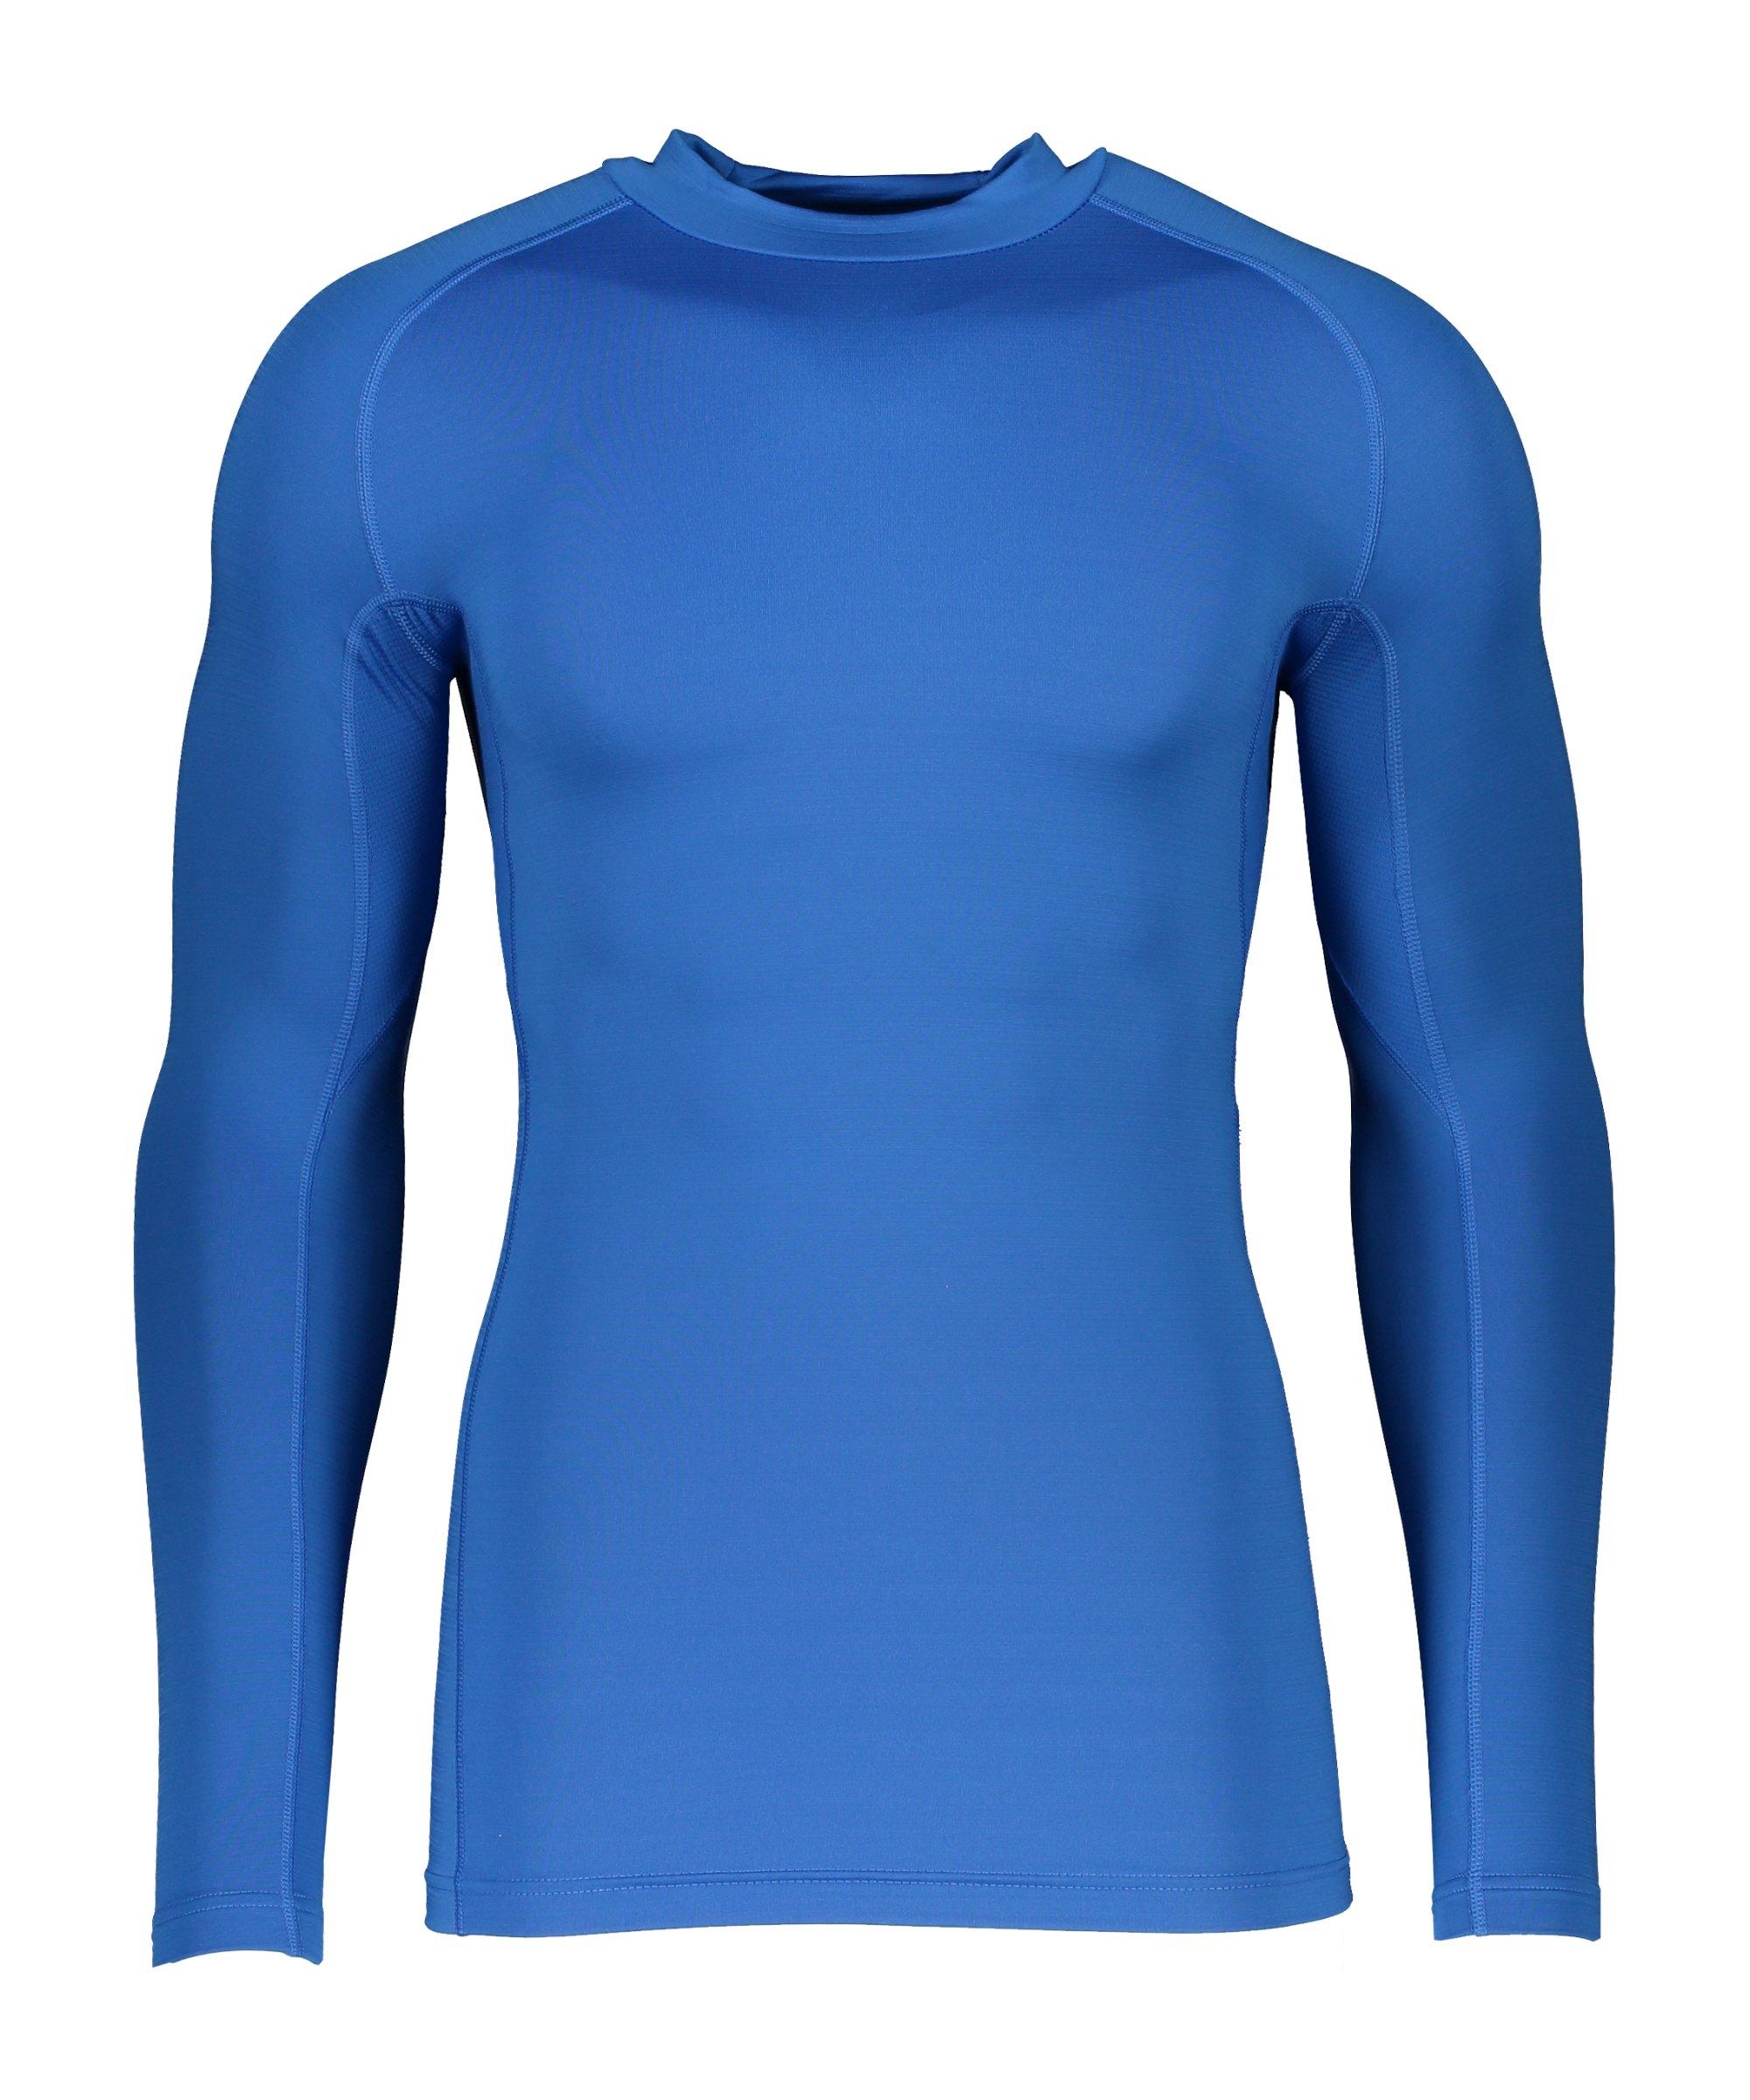 Nike NP Hyperwarm Max Comp Mock Sweatshirt F463 - blau